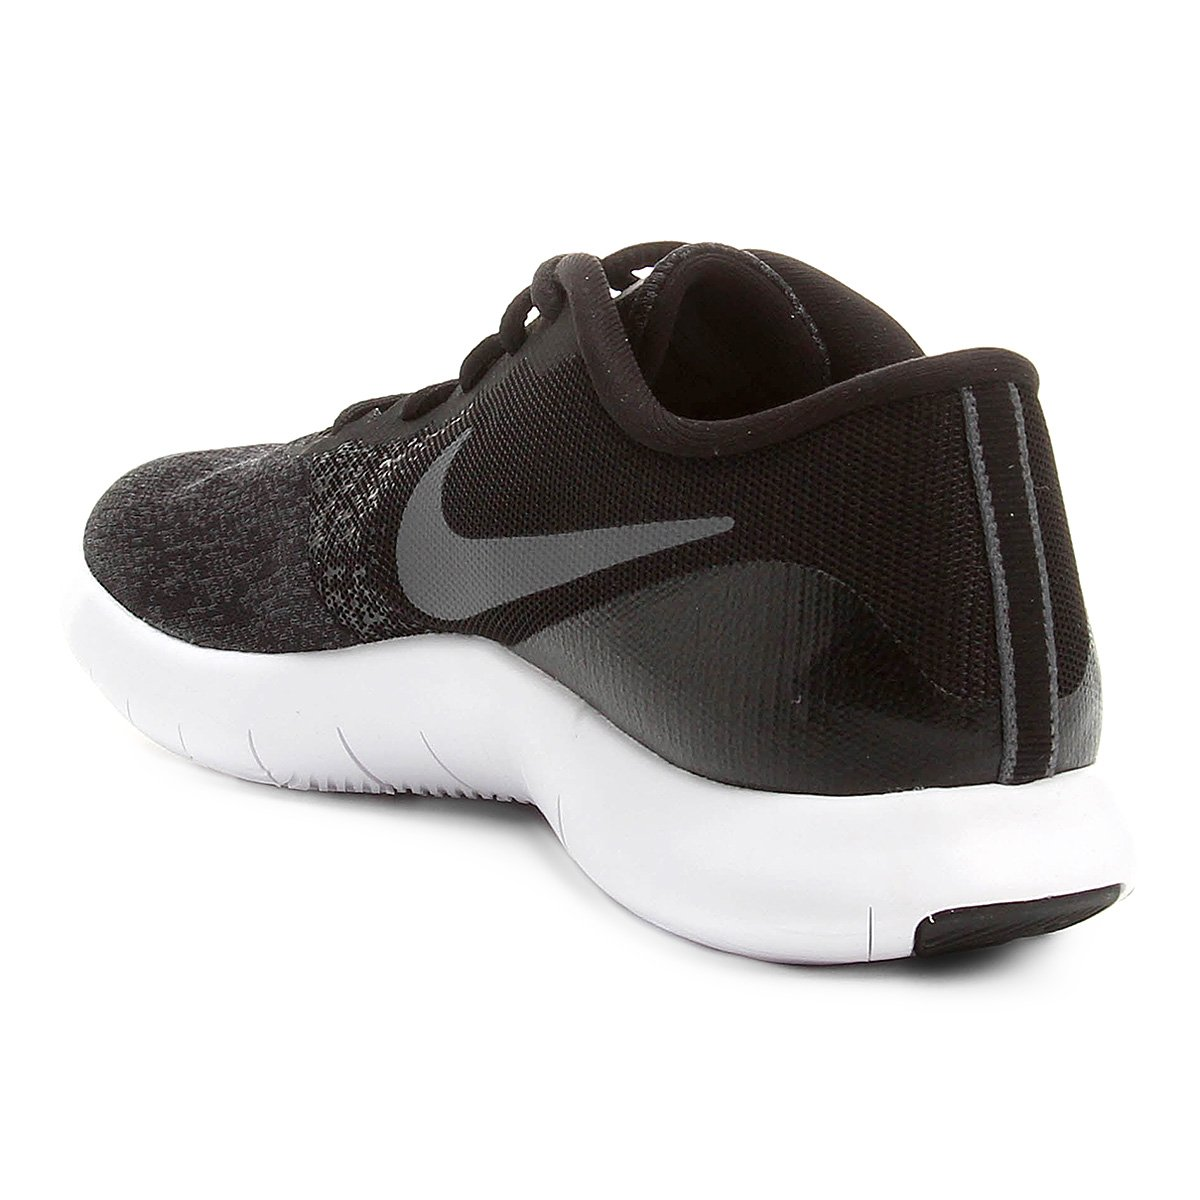 d2c19a737c Tênis Nike Flex Contact Masculino - Preto e Cinza - Compre Agora ...